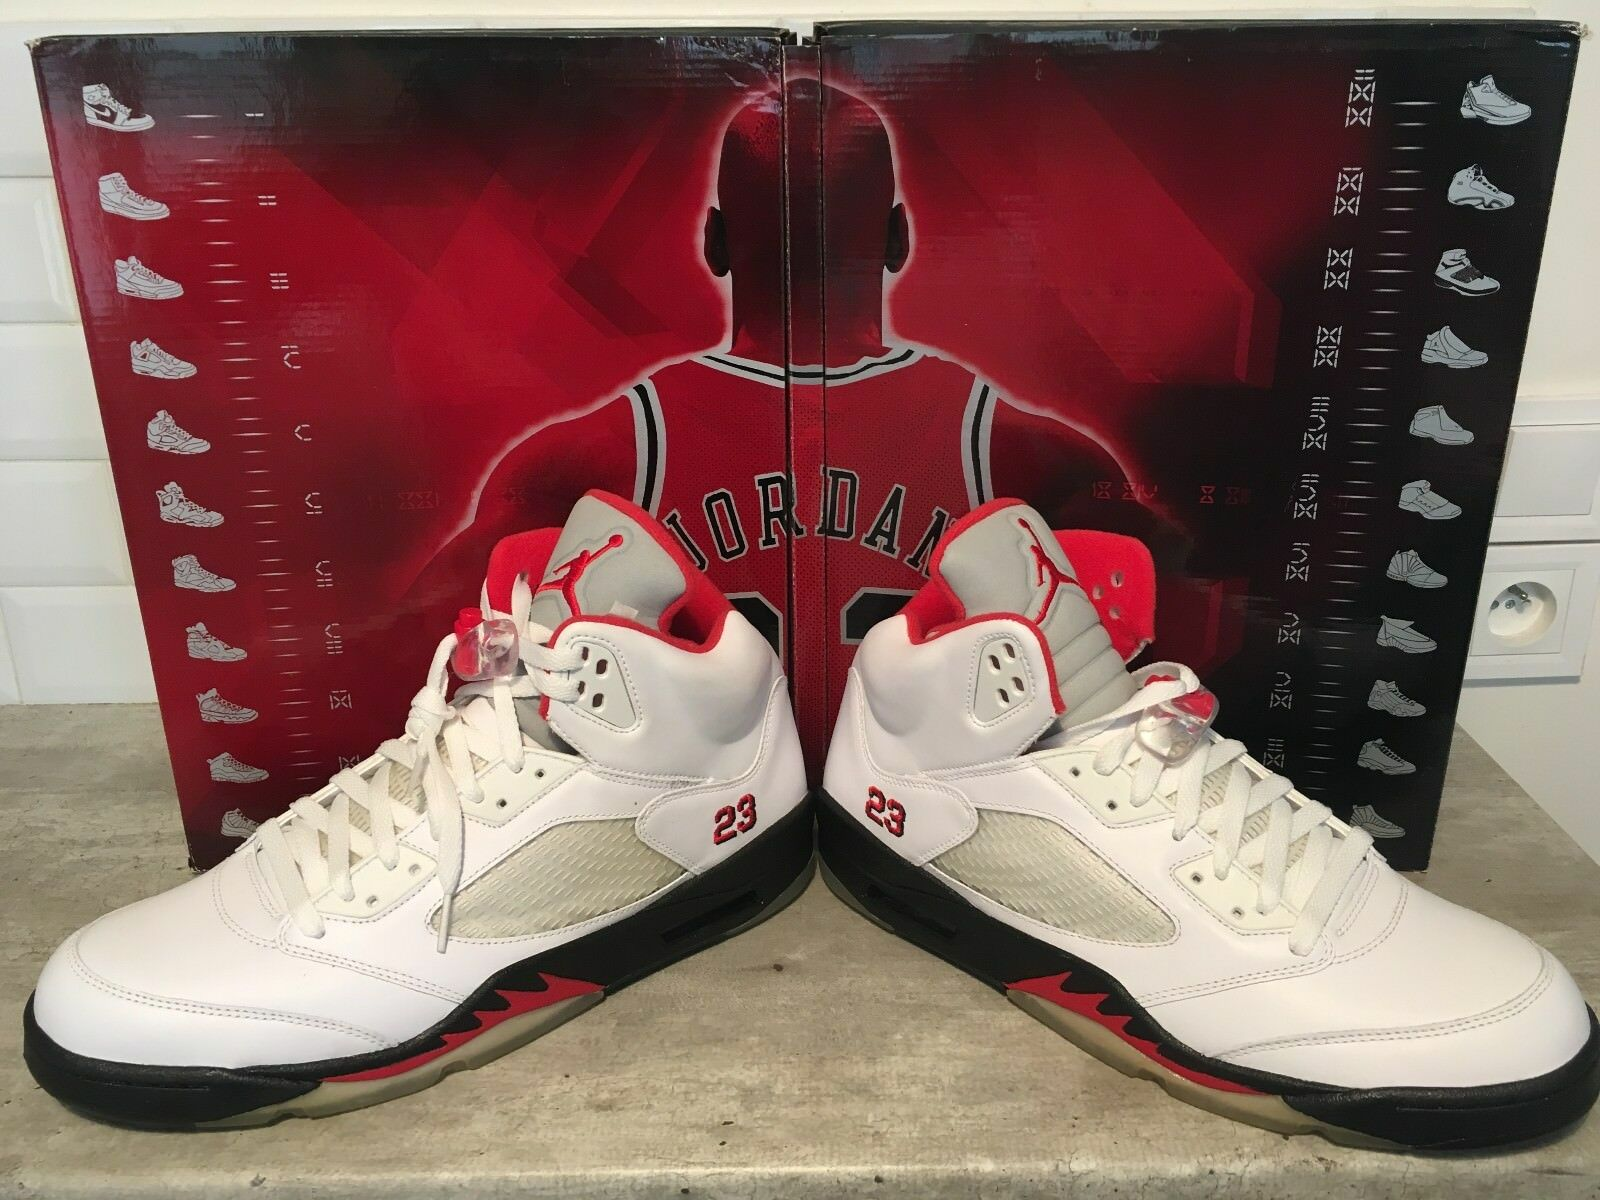 Nike Air Jordan Retro 5 pack collezione 12.5 47 47 47 aaef94